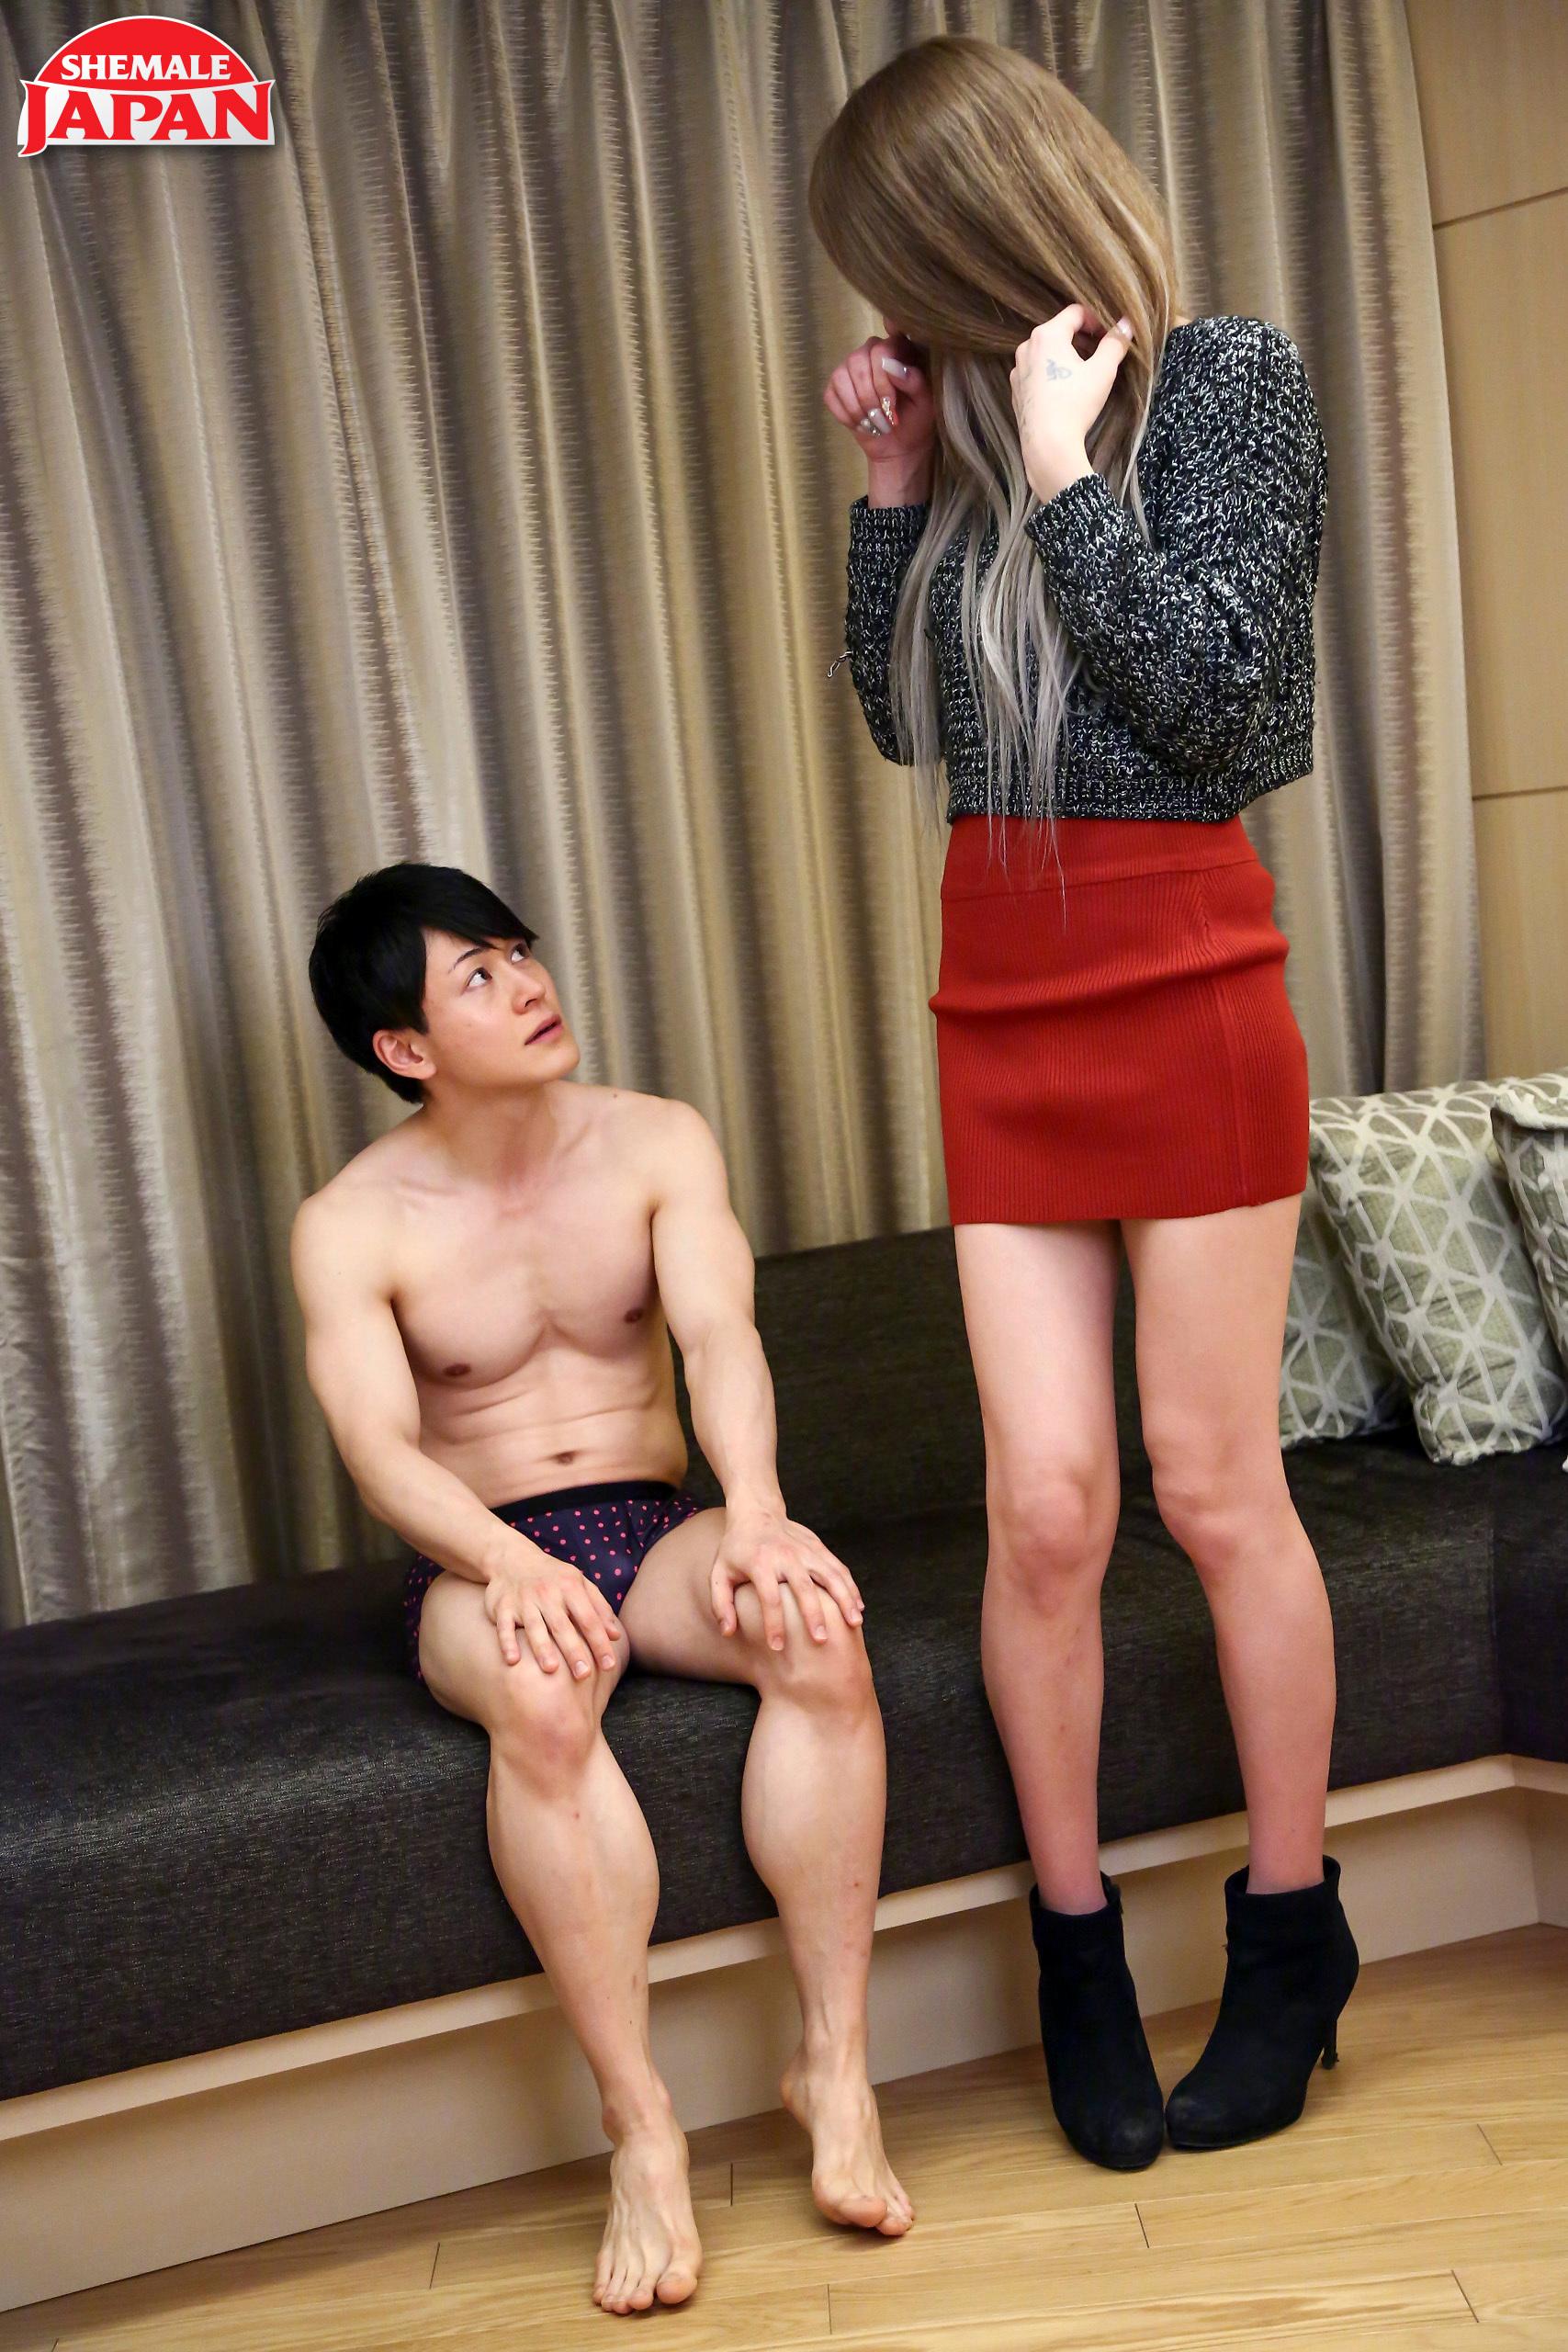 Meika Kuroki Gets Her Bum Pounded!